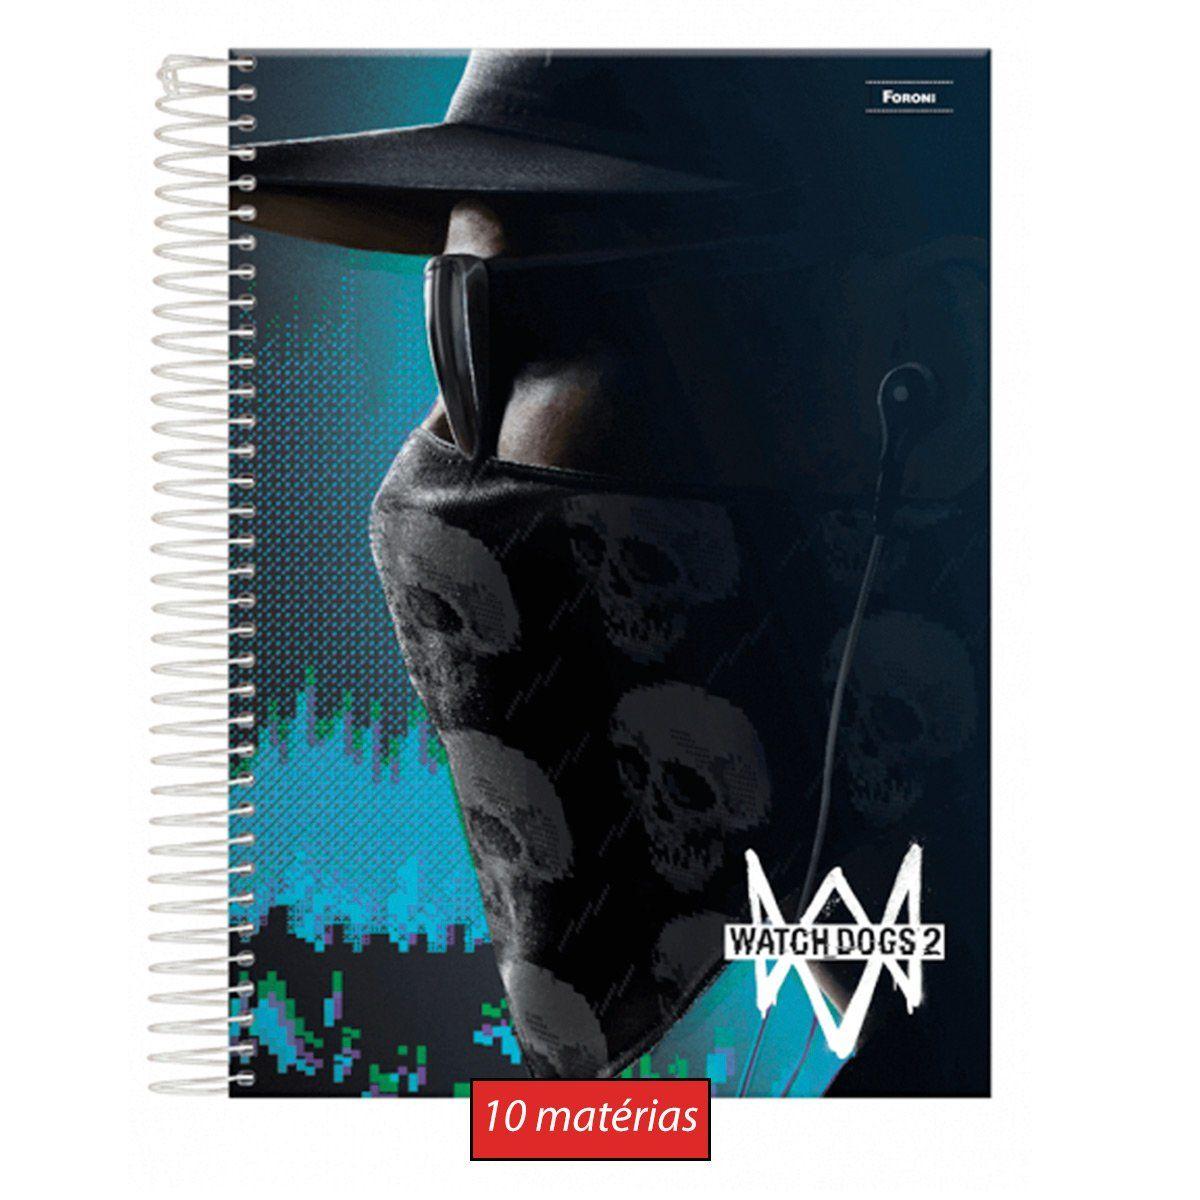 Caderno Watch Dogs 2 Mask 10 matérias